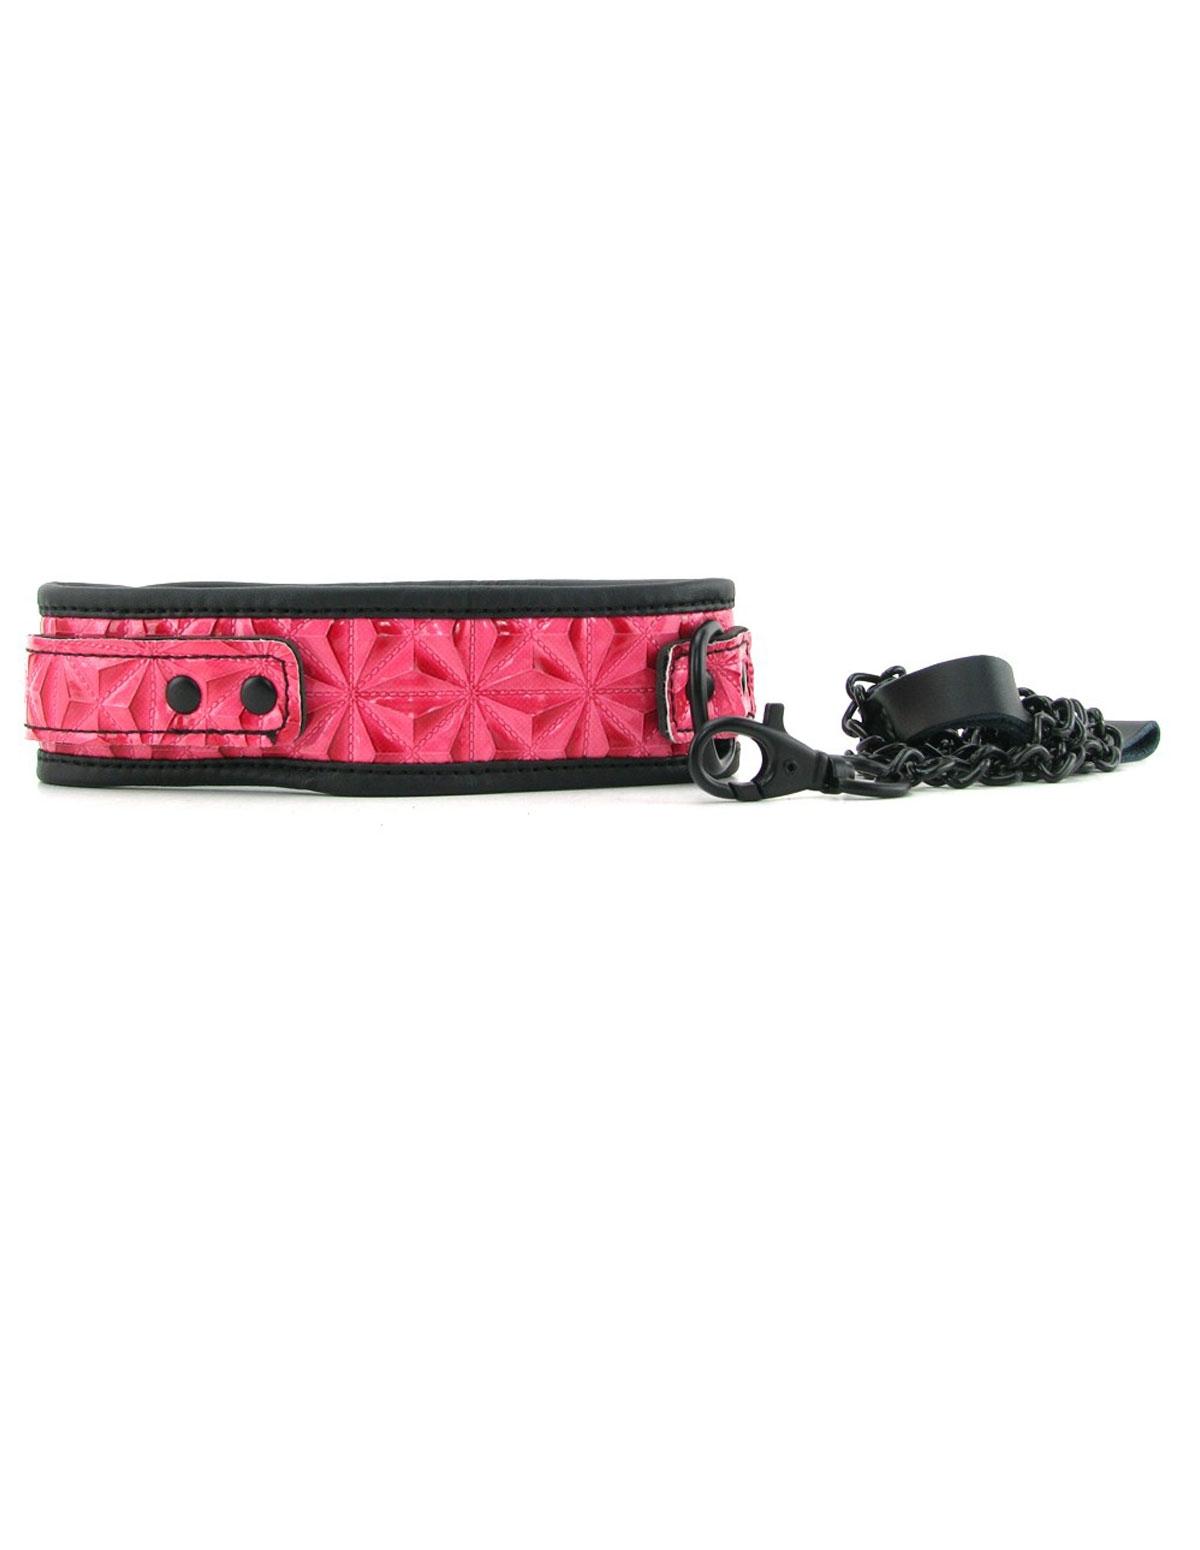 Sinful Collar & Leash Pink